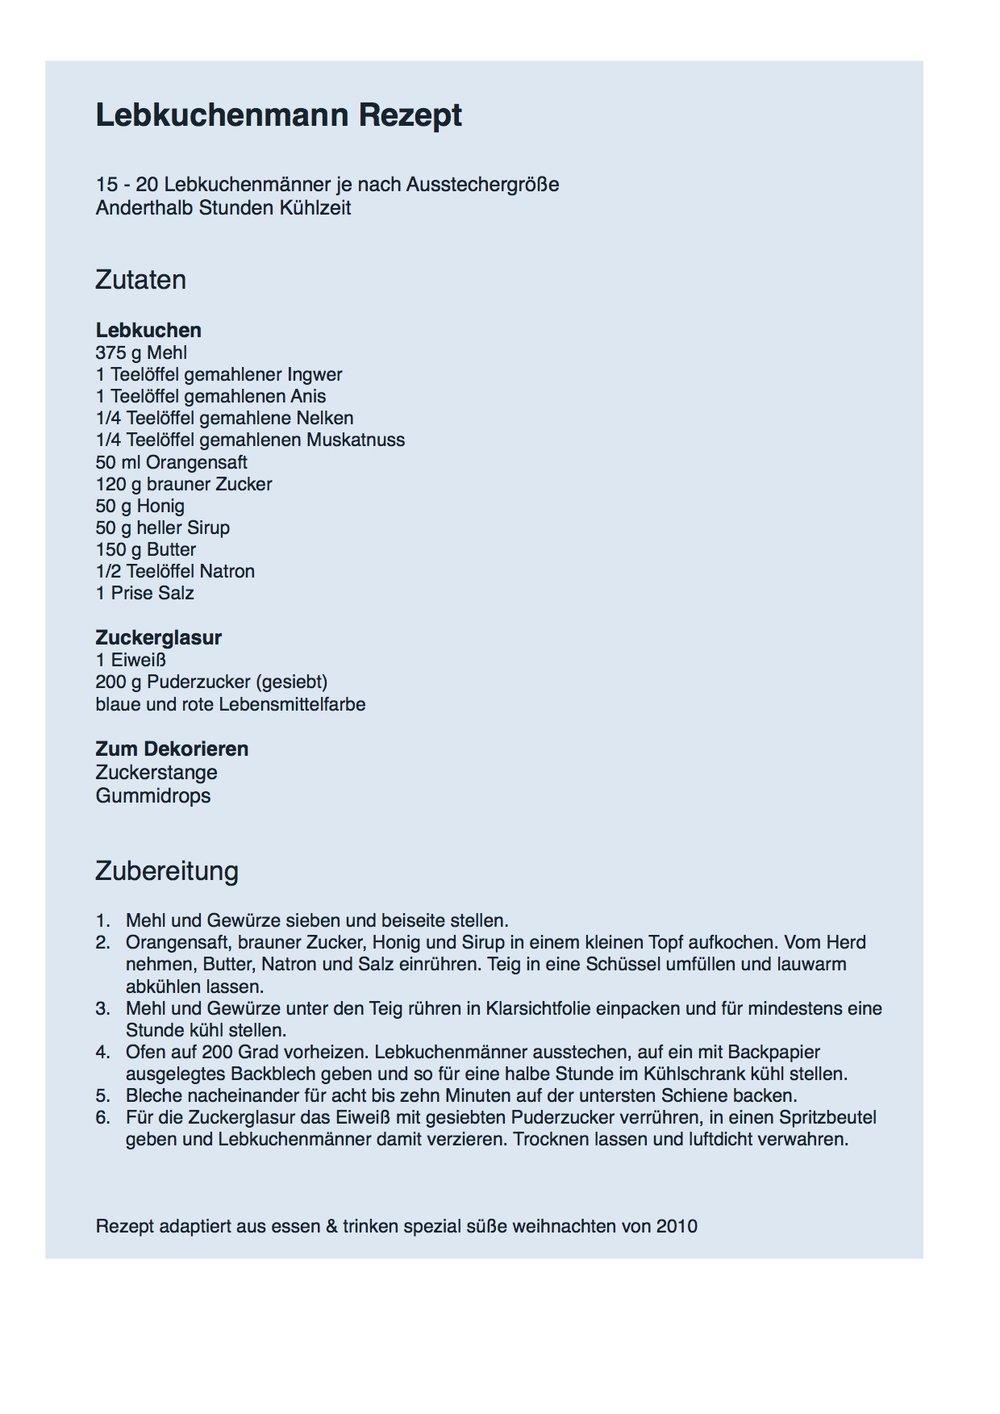 Lebkuchenmann Rezept.jpg